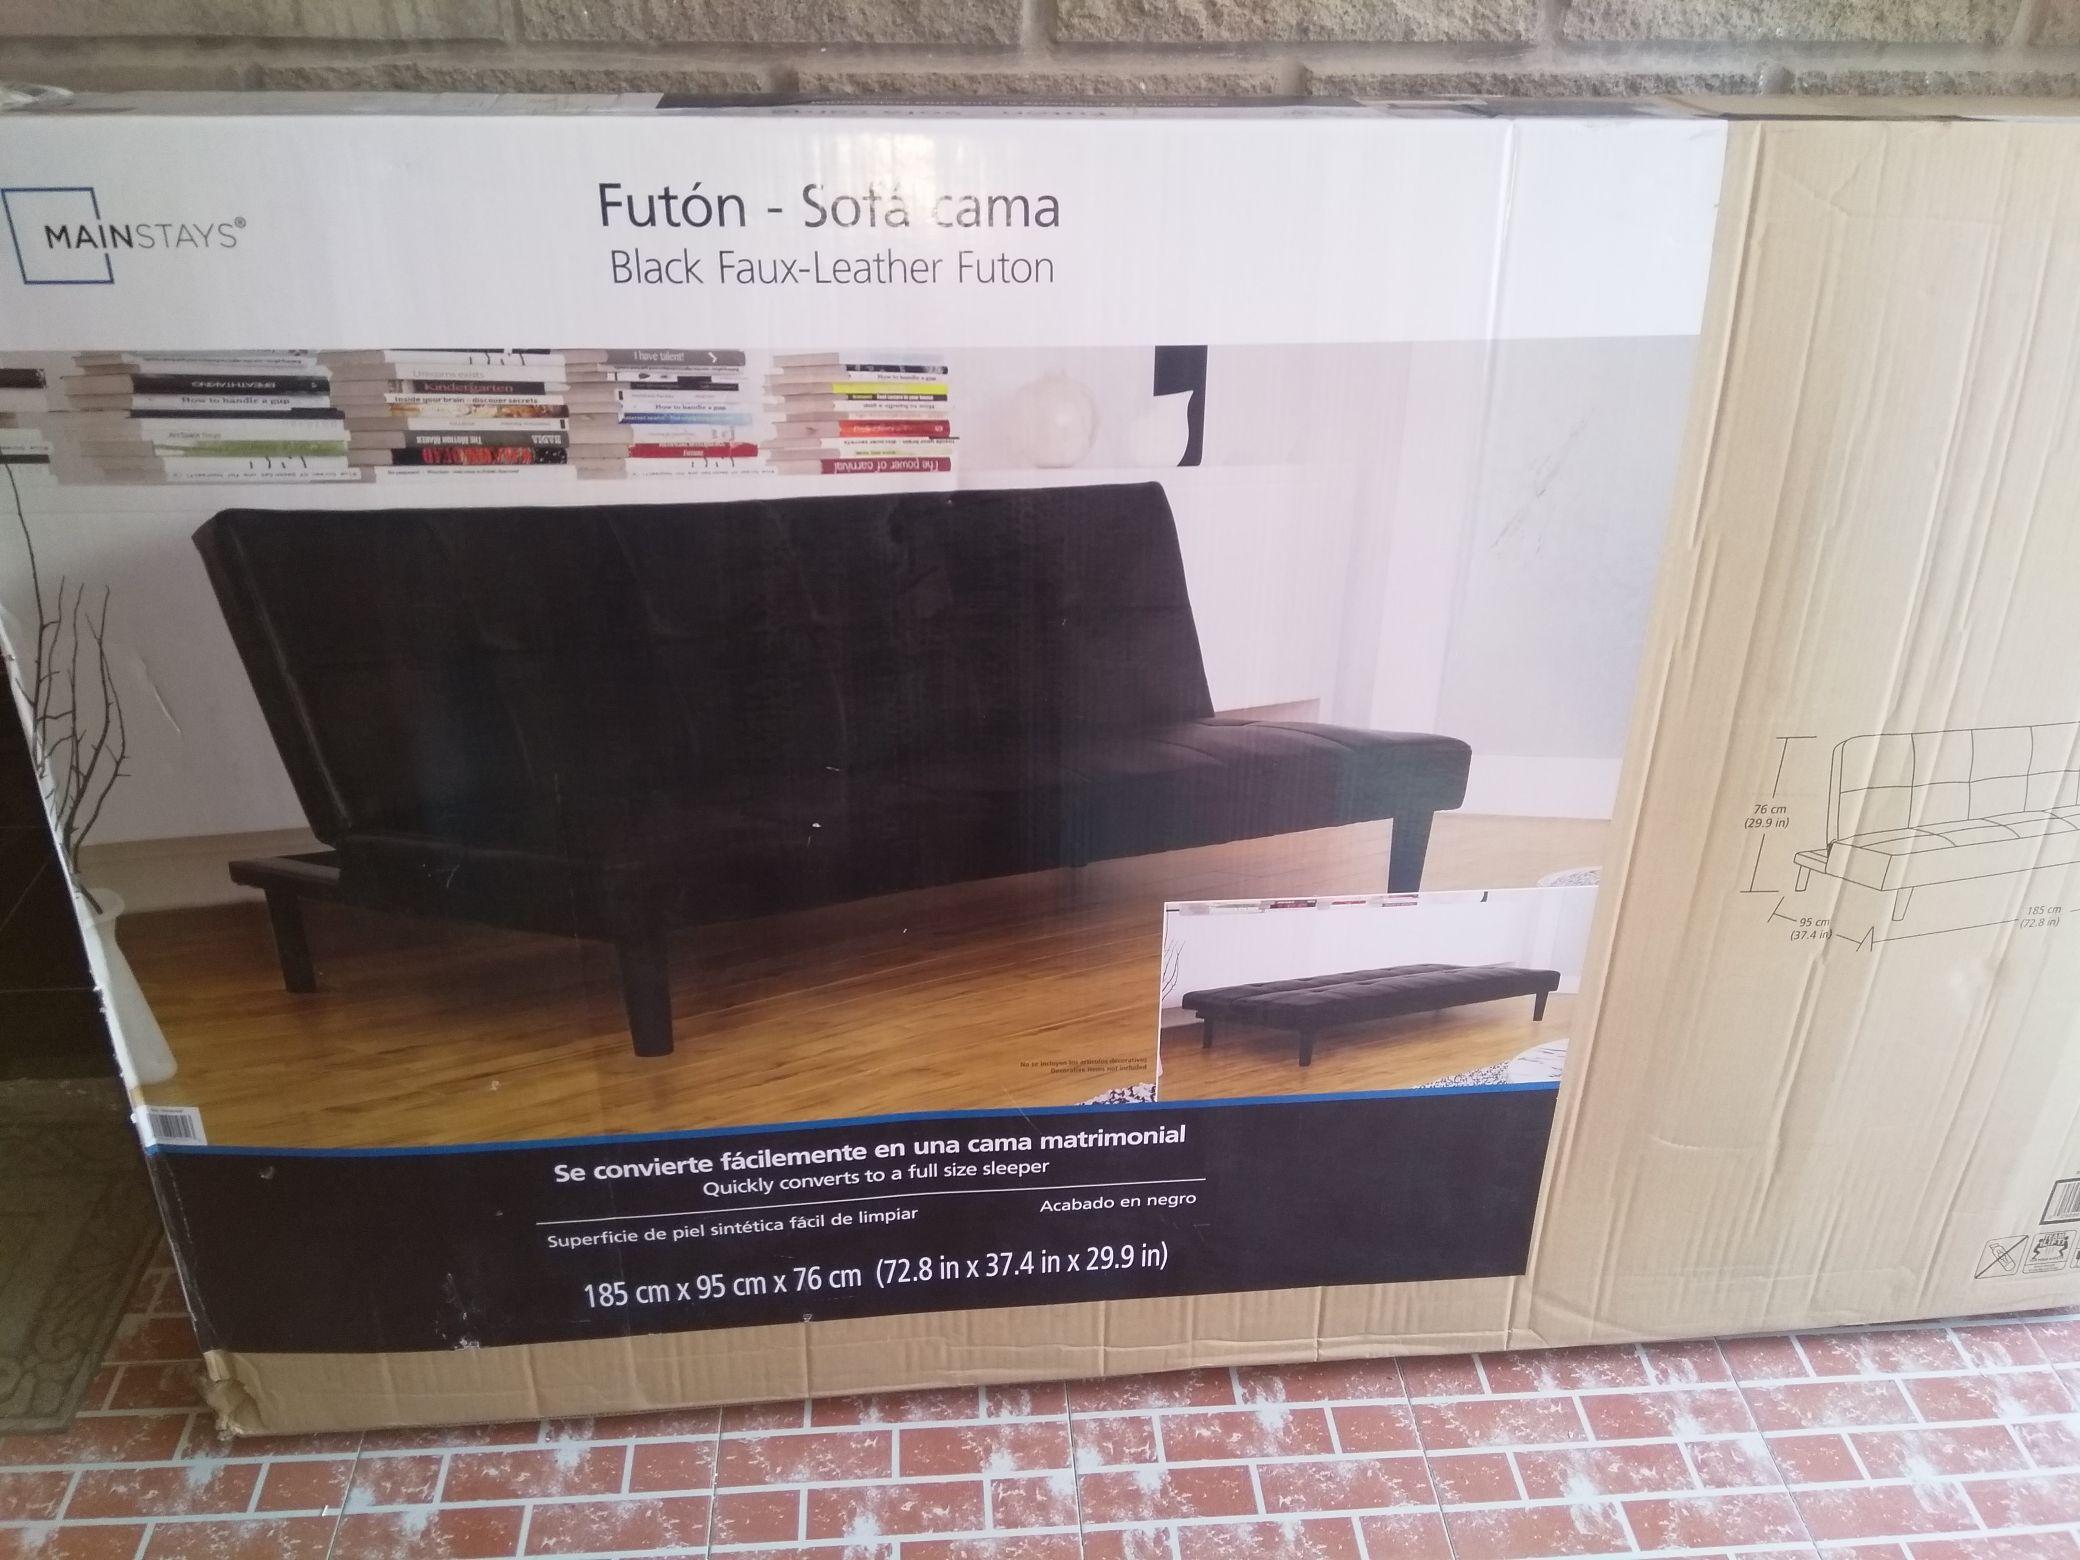 Bodega Aurrera: Sofa Cama Futon Mainstays